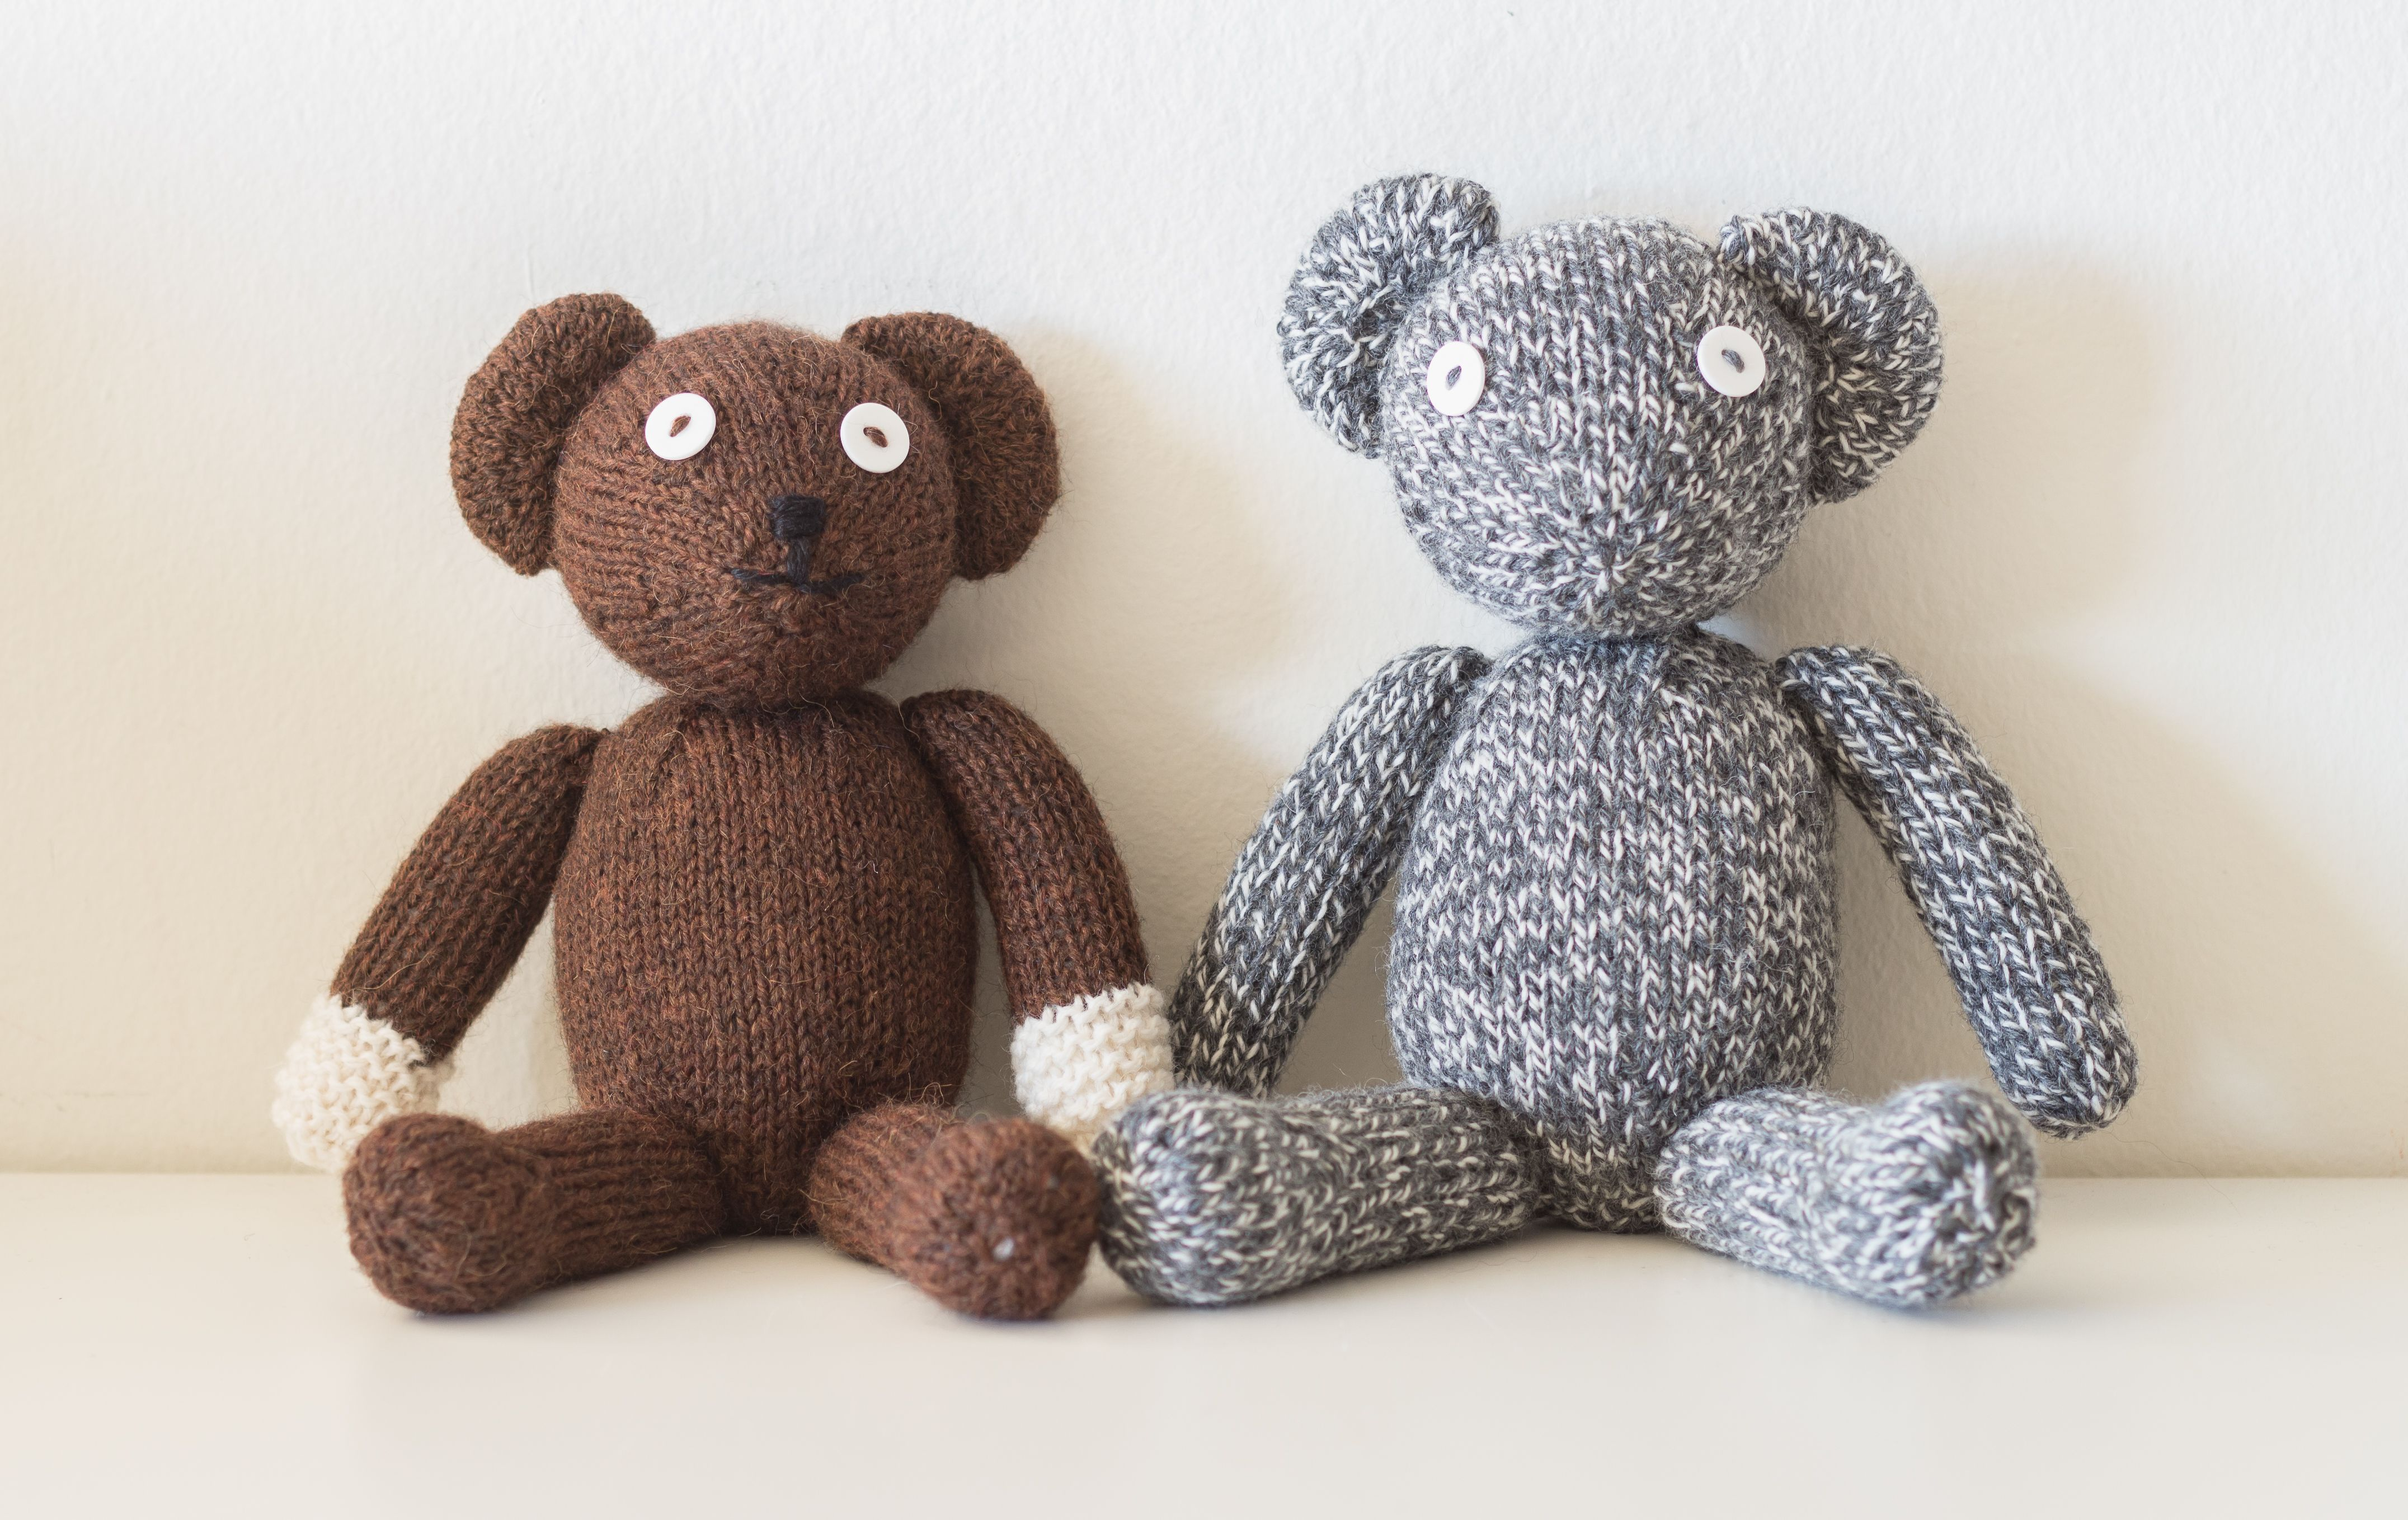 Amigurumi Crochet Patterns Teddy Bears : Custom knit mr bean bear toys dolls and amigurumi